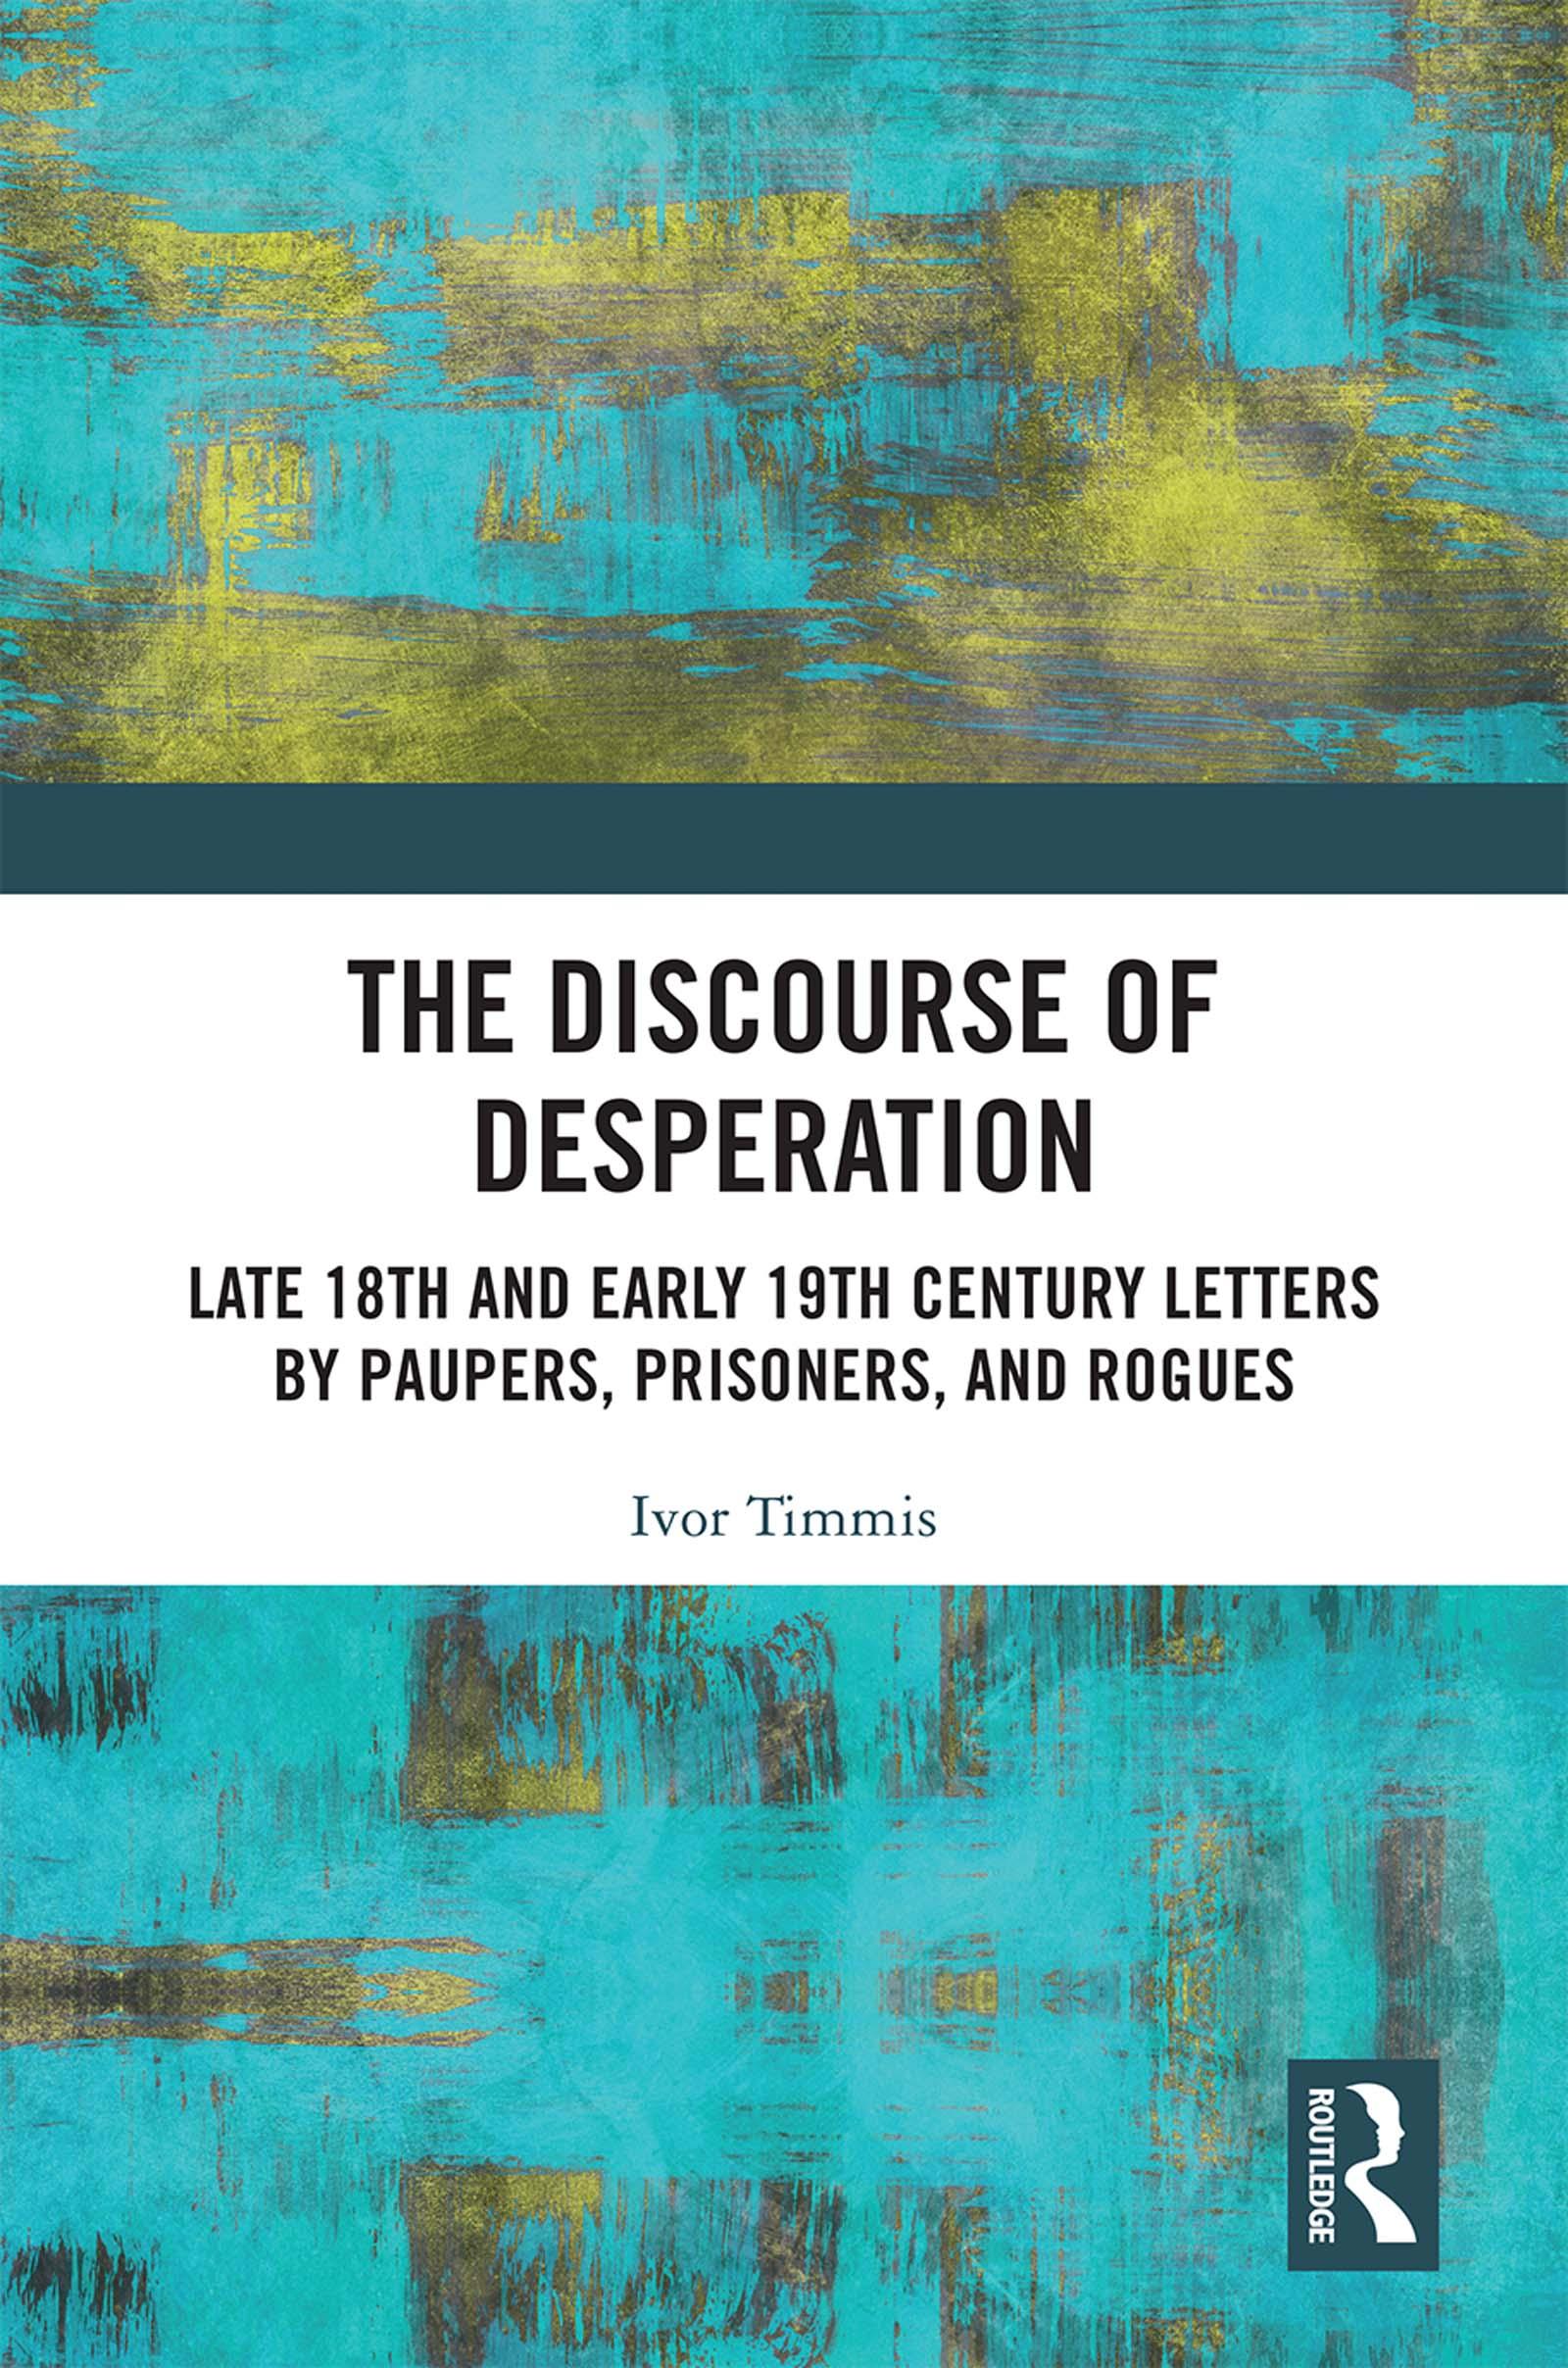 The Discourse of Desperation